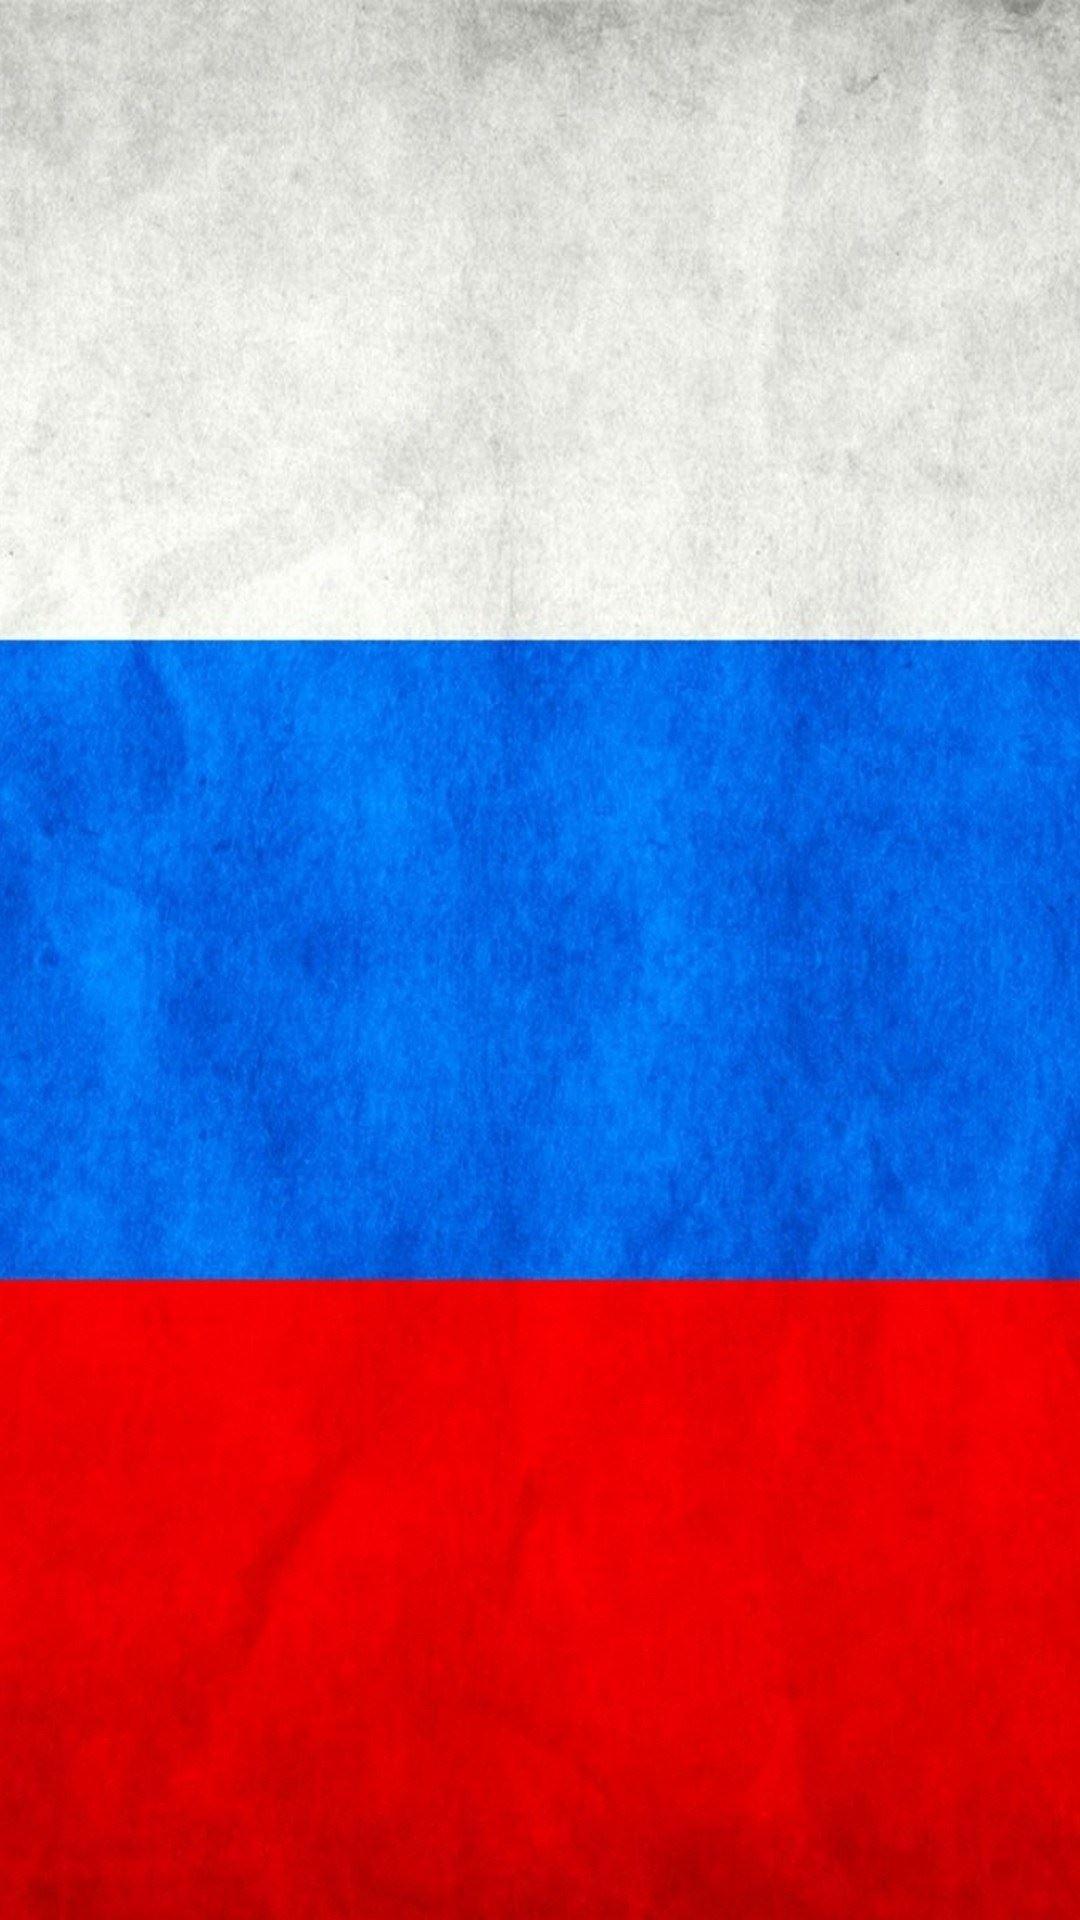 Russia Flag iPhone 6 Plus HD Wallpaper.jpg 1,080×1,920 pixels